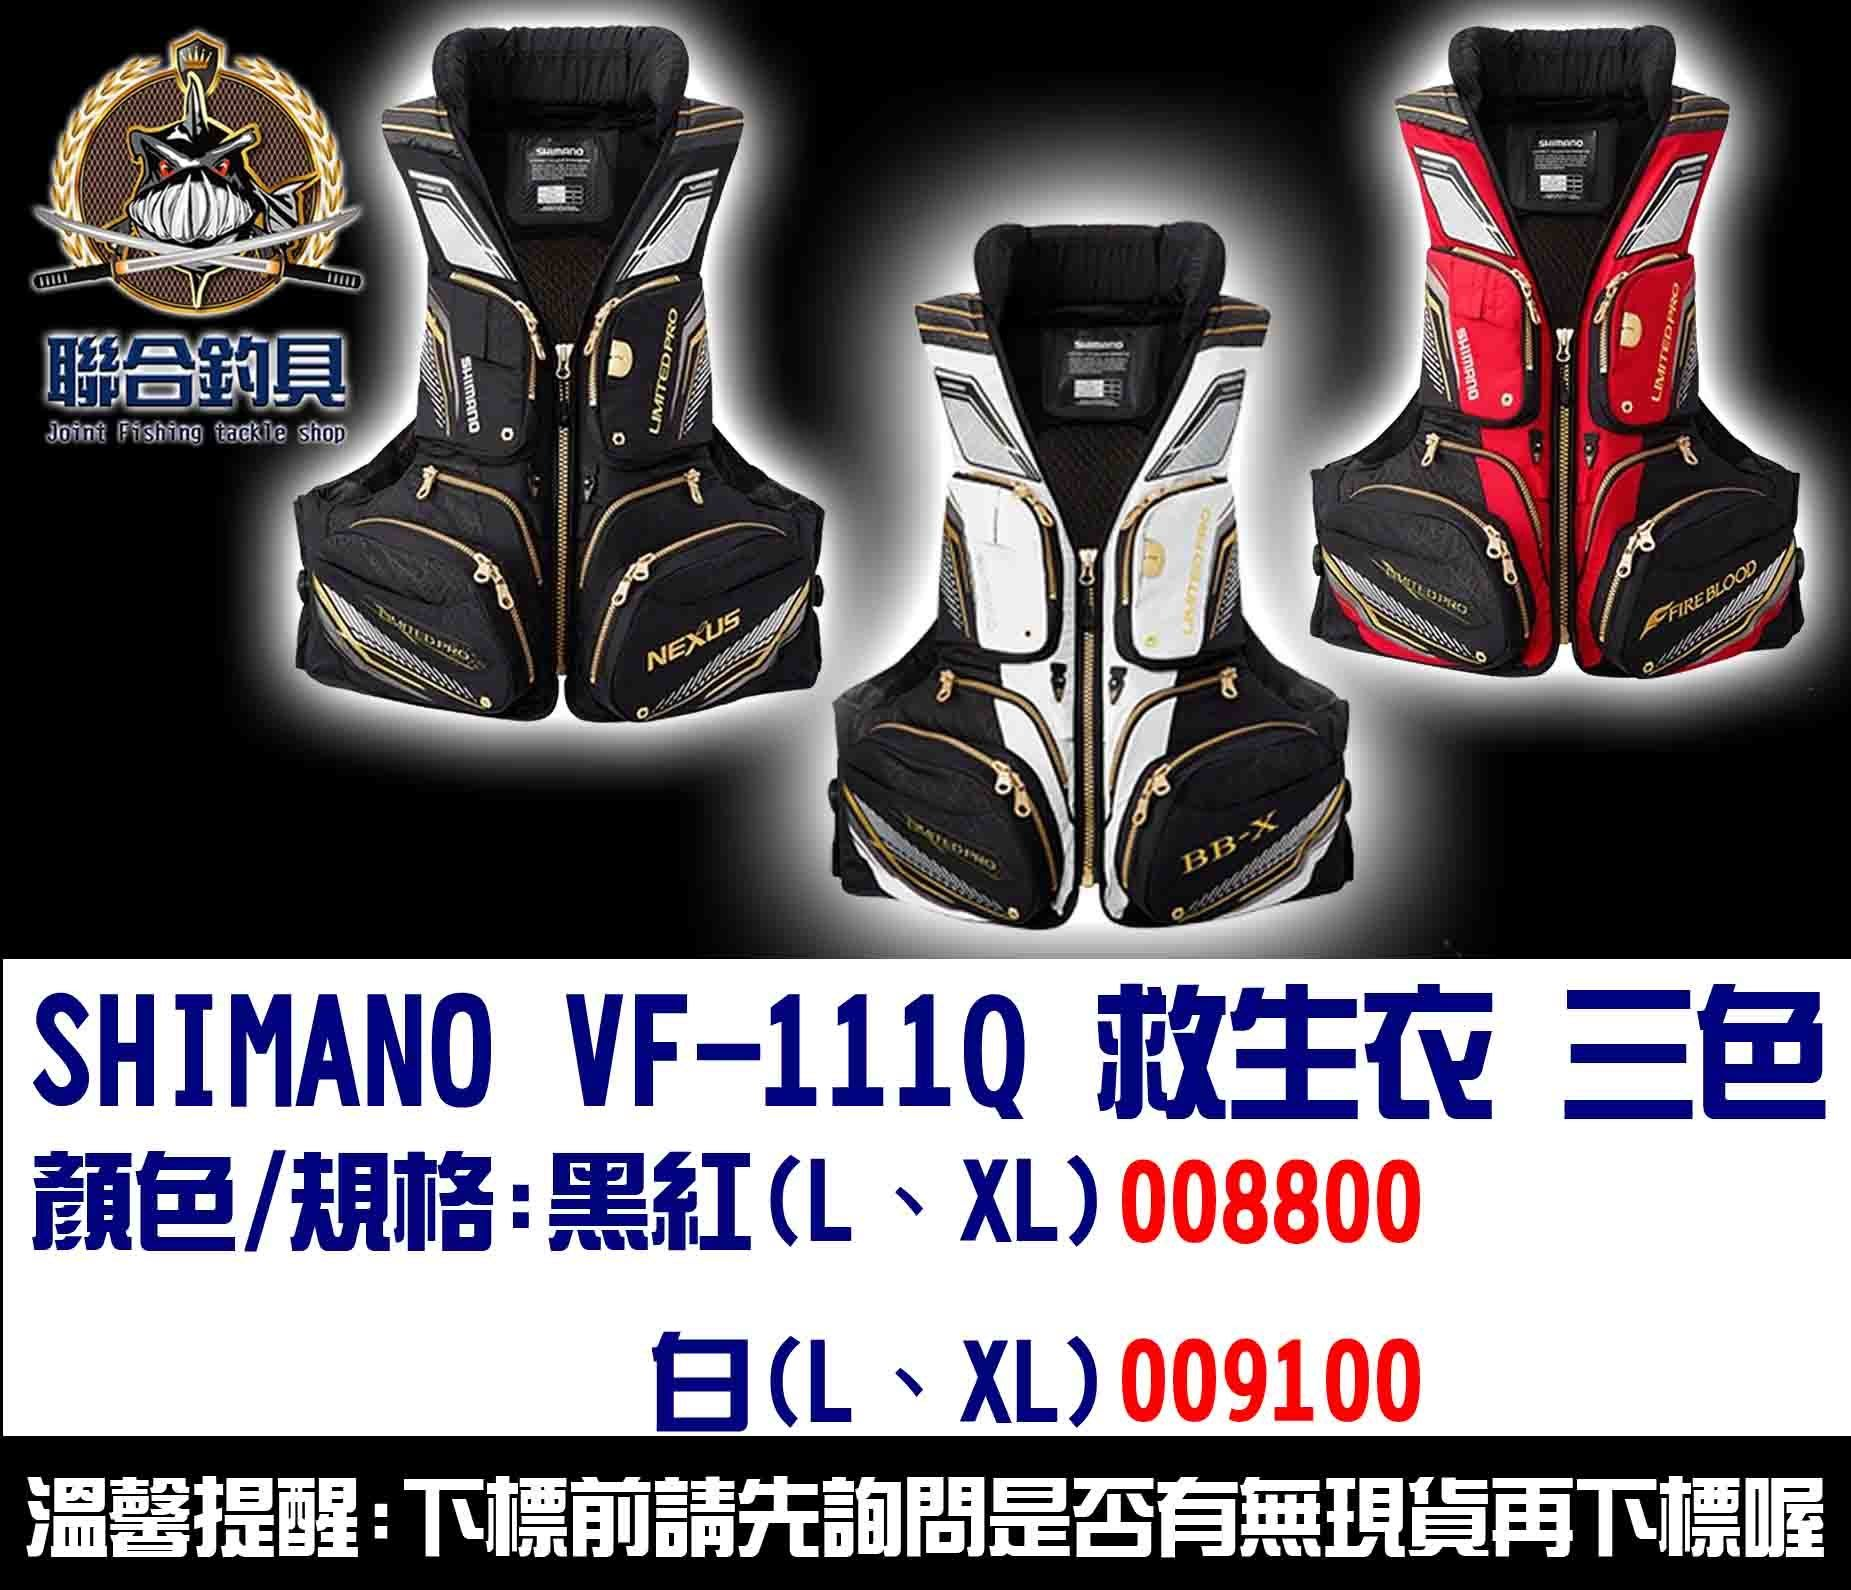 【聯合釣具-竹南店】SHIMANO VF-111Q 救生衣